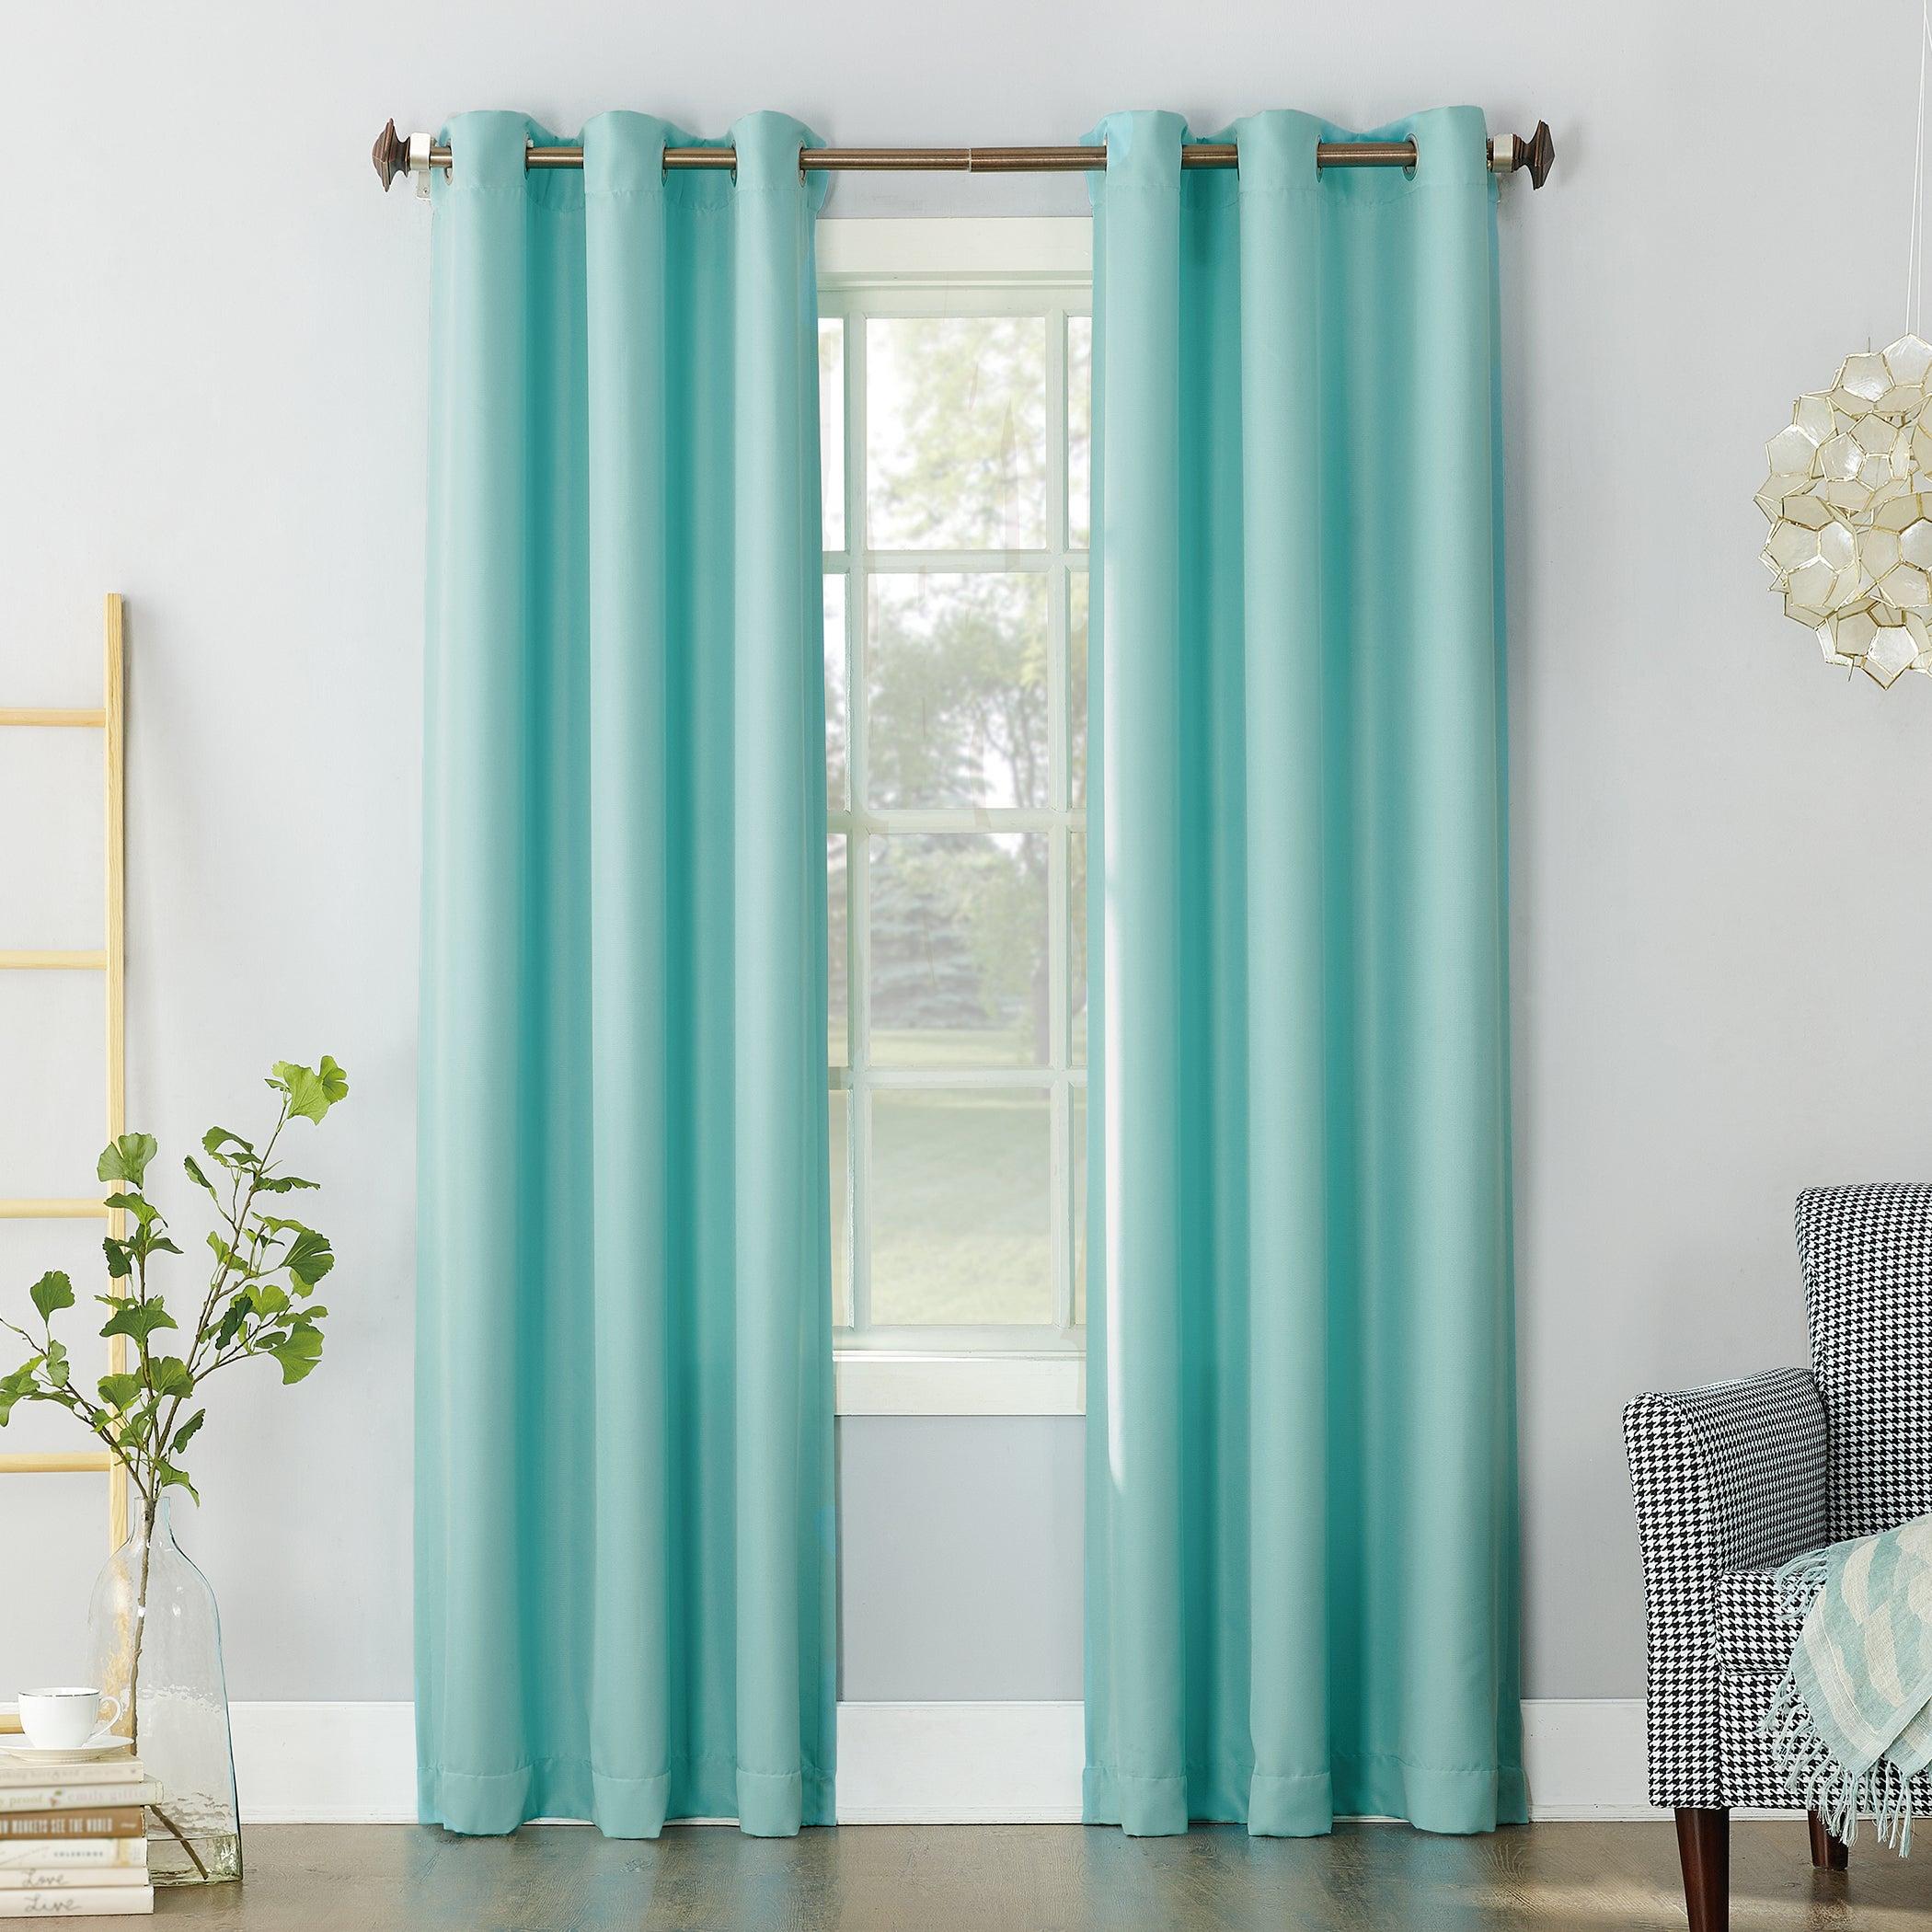 Shop Copper Grove Speedwell Grommet Window Curtain Panel Pertaining To Copper Grove Speedwell Grommet Window Curtain Panels (View 16 of 20)